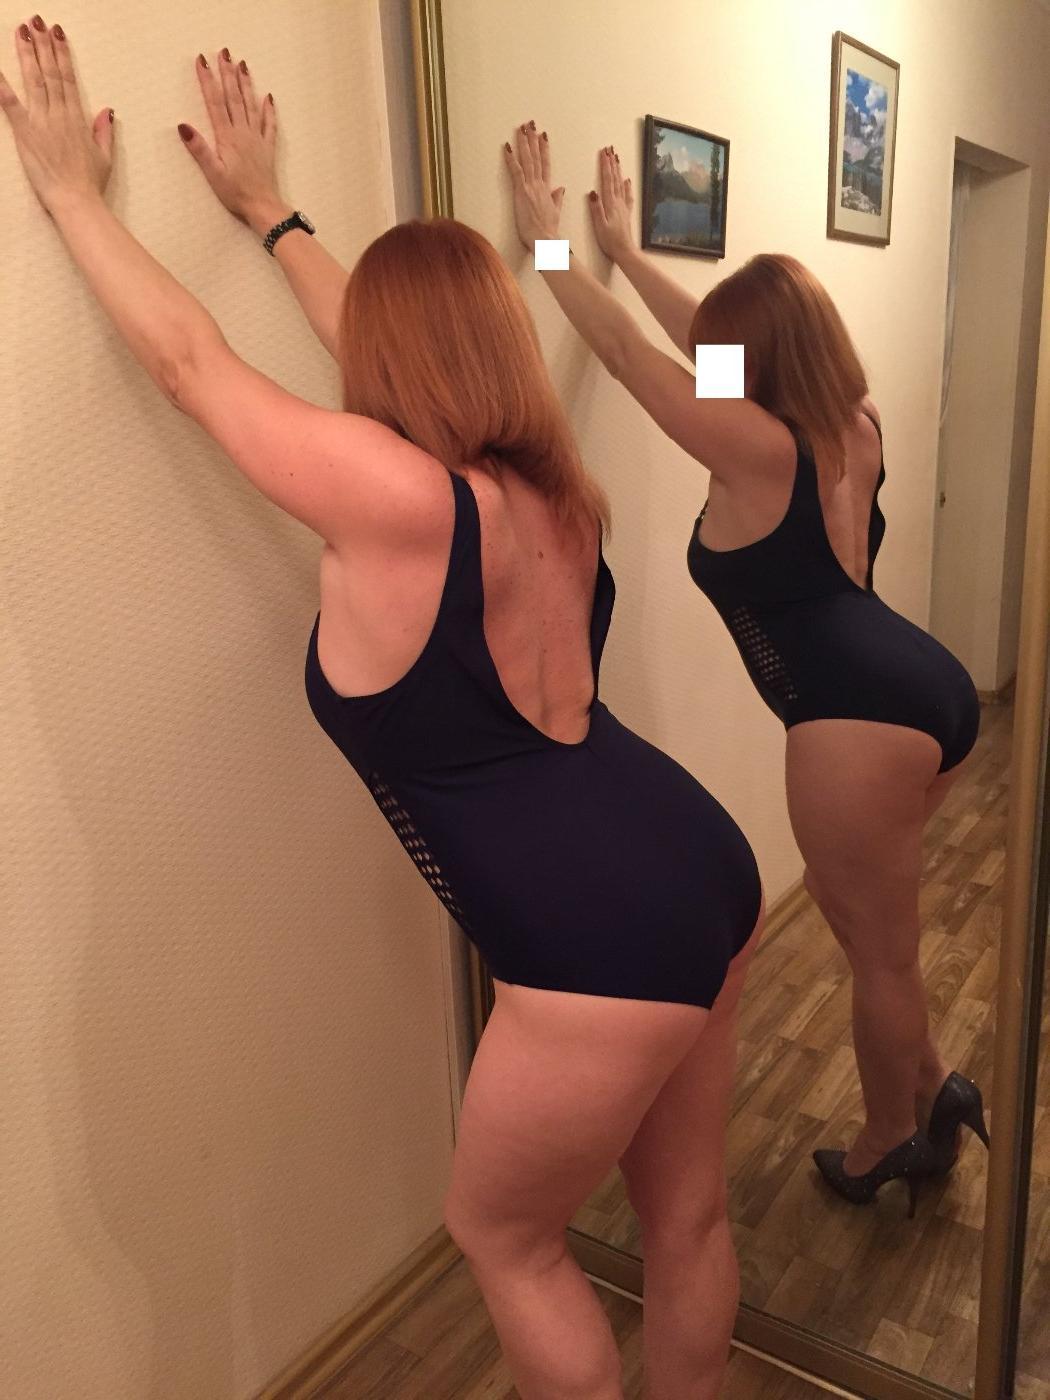 Проститутка Анжелика, 29 лет, метро Лубянка